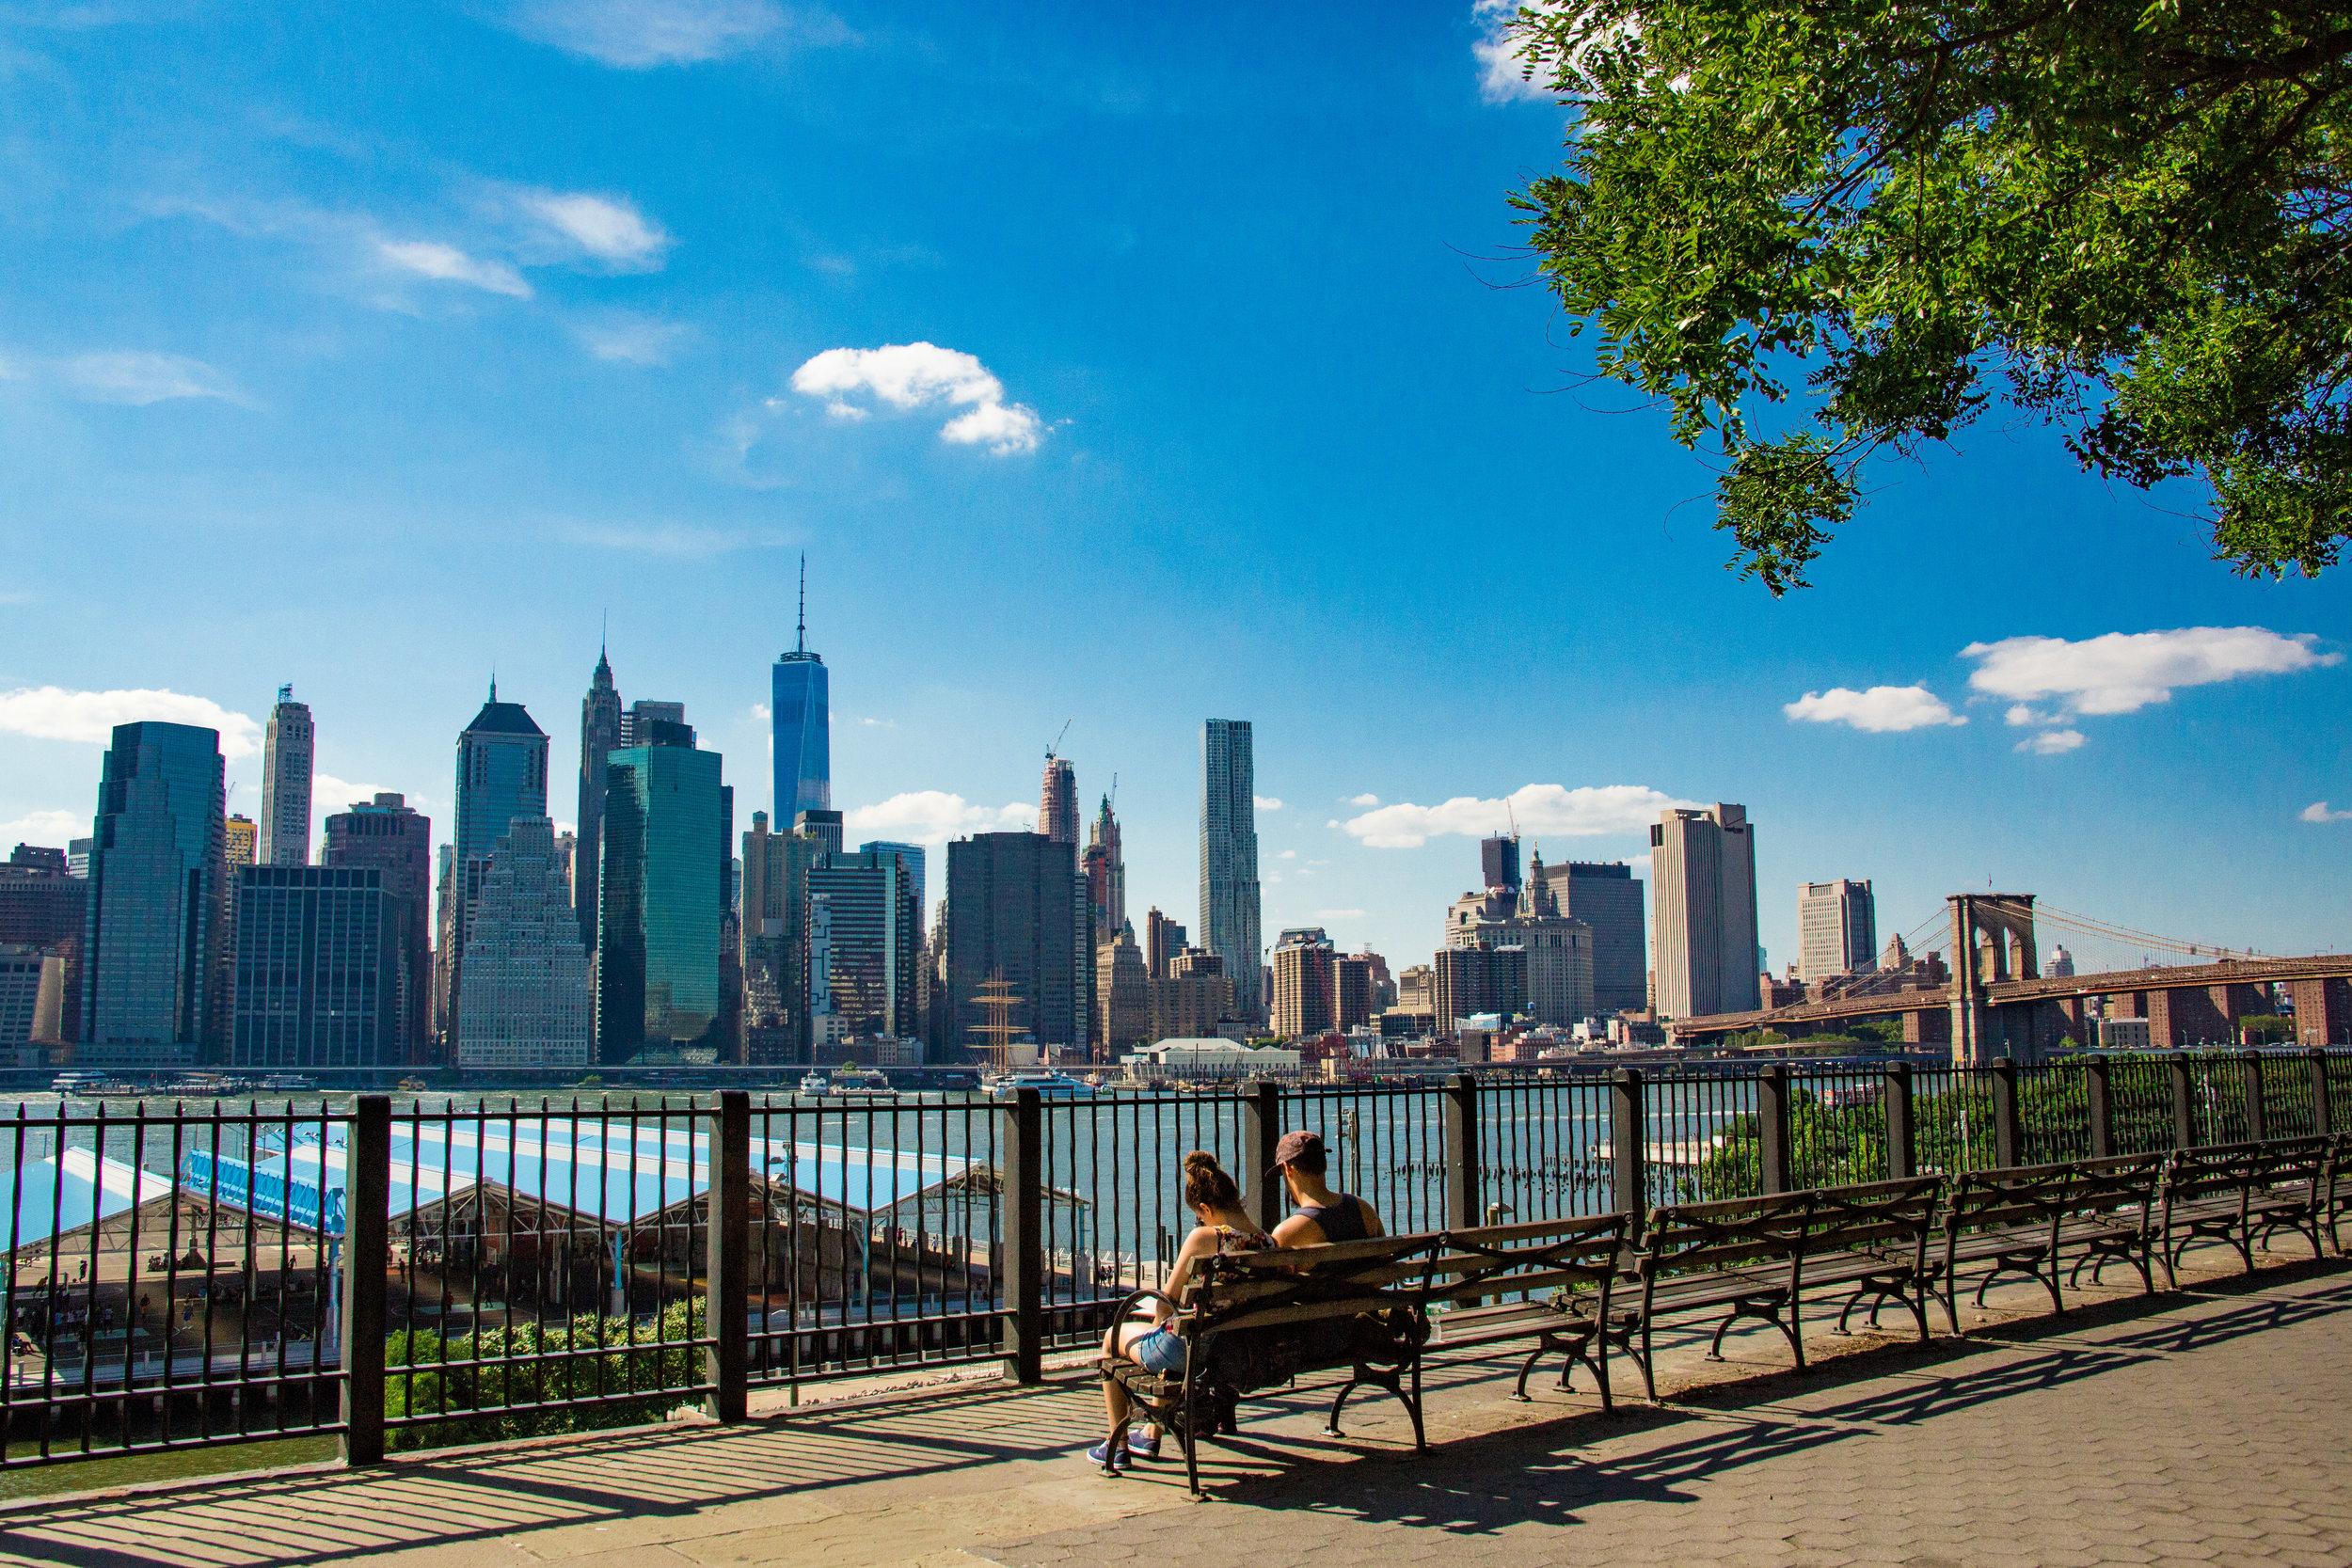 LSNY_Brooklyn_Bridge_Park-84.jpg